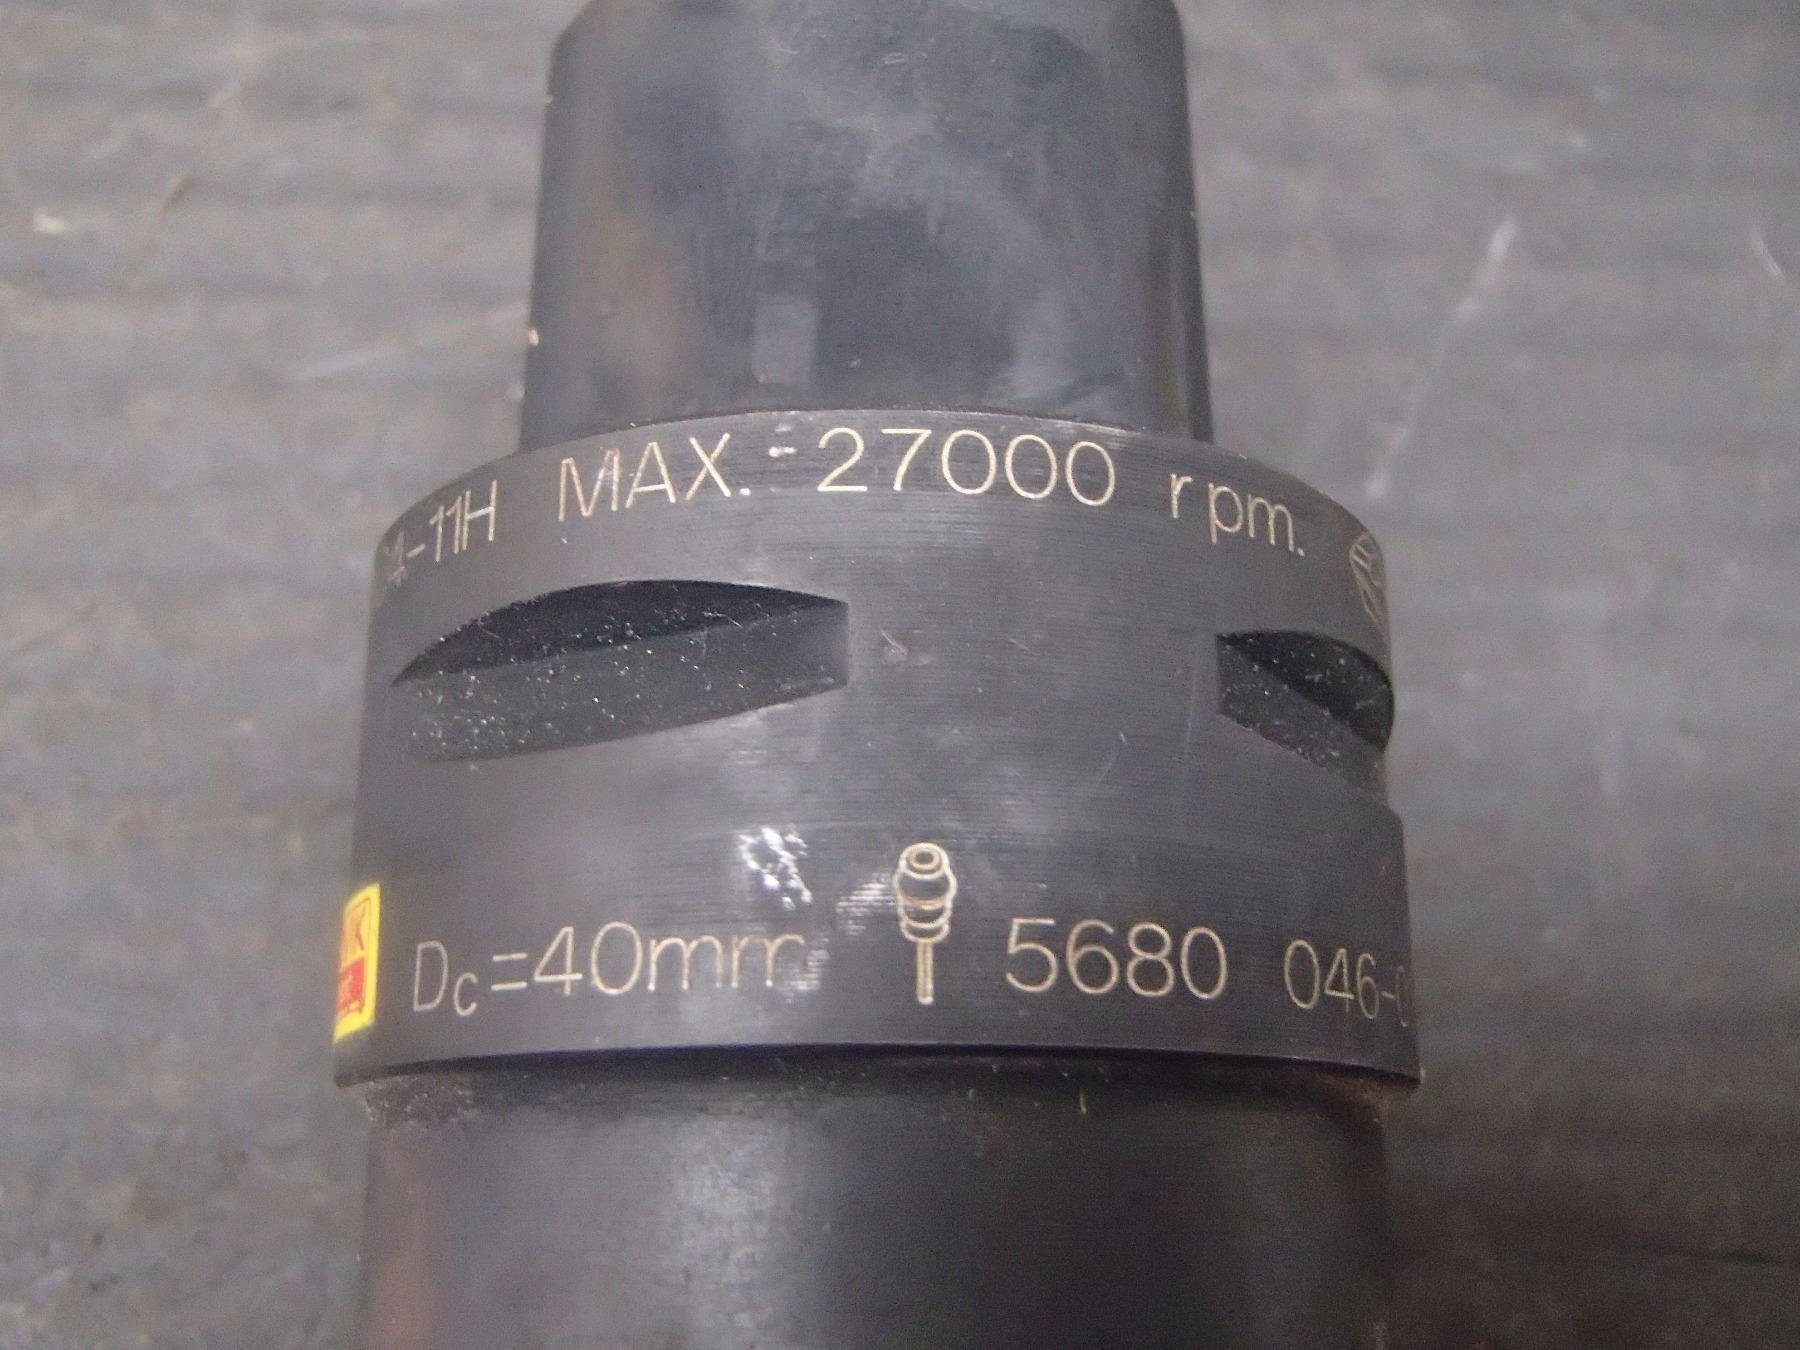 Sandvik C4 40mm Coolant Thru Indexable Mill, P/N: R390-040C4-11H